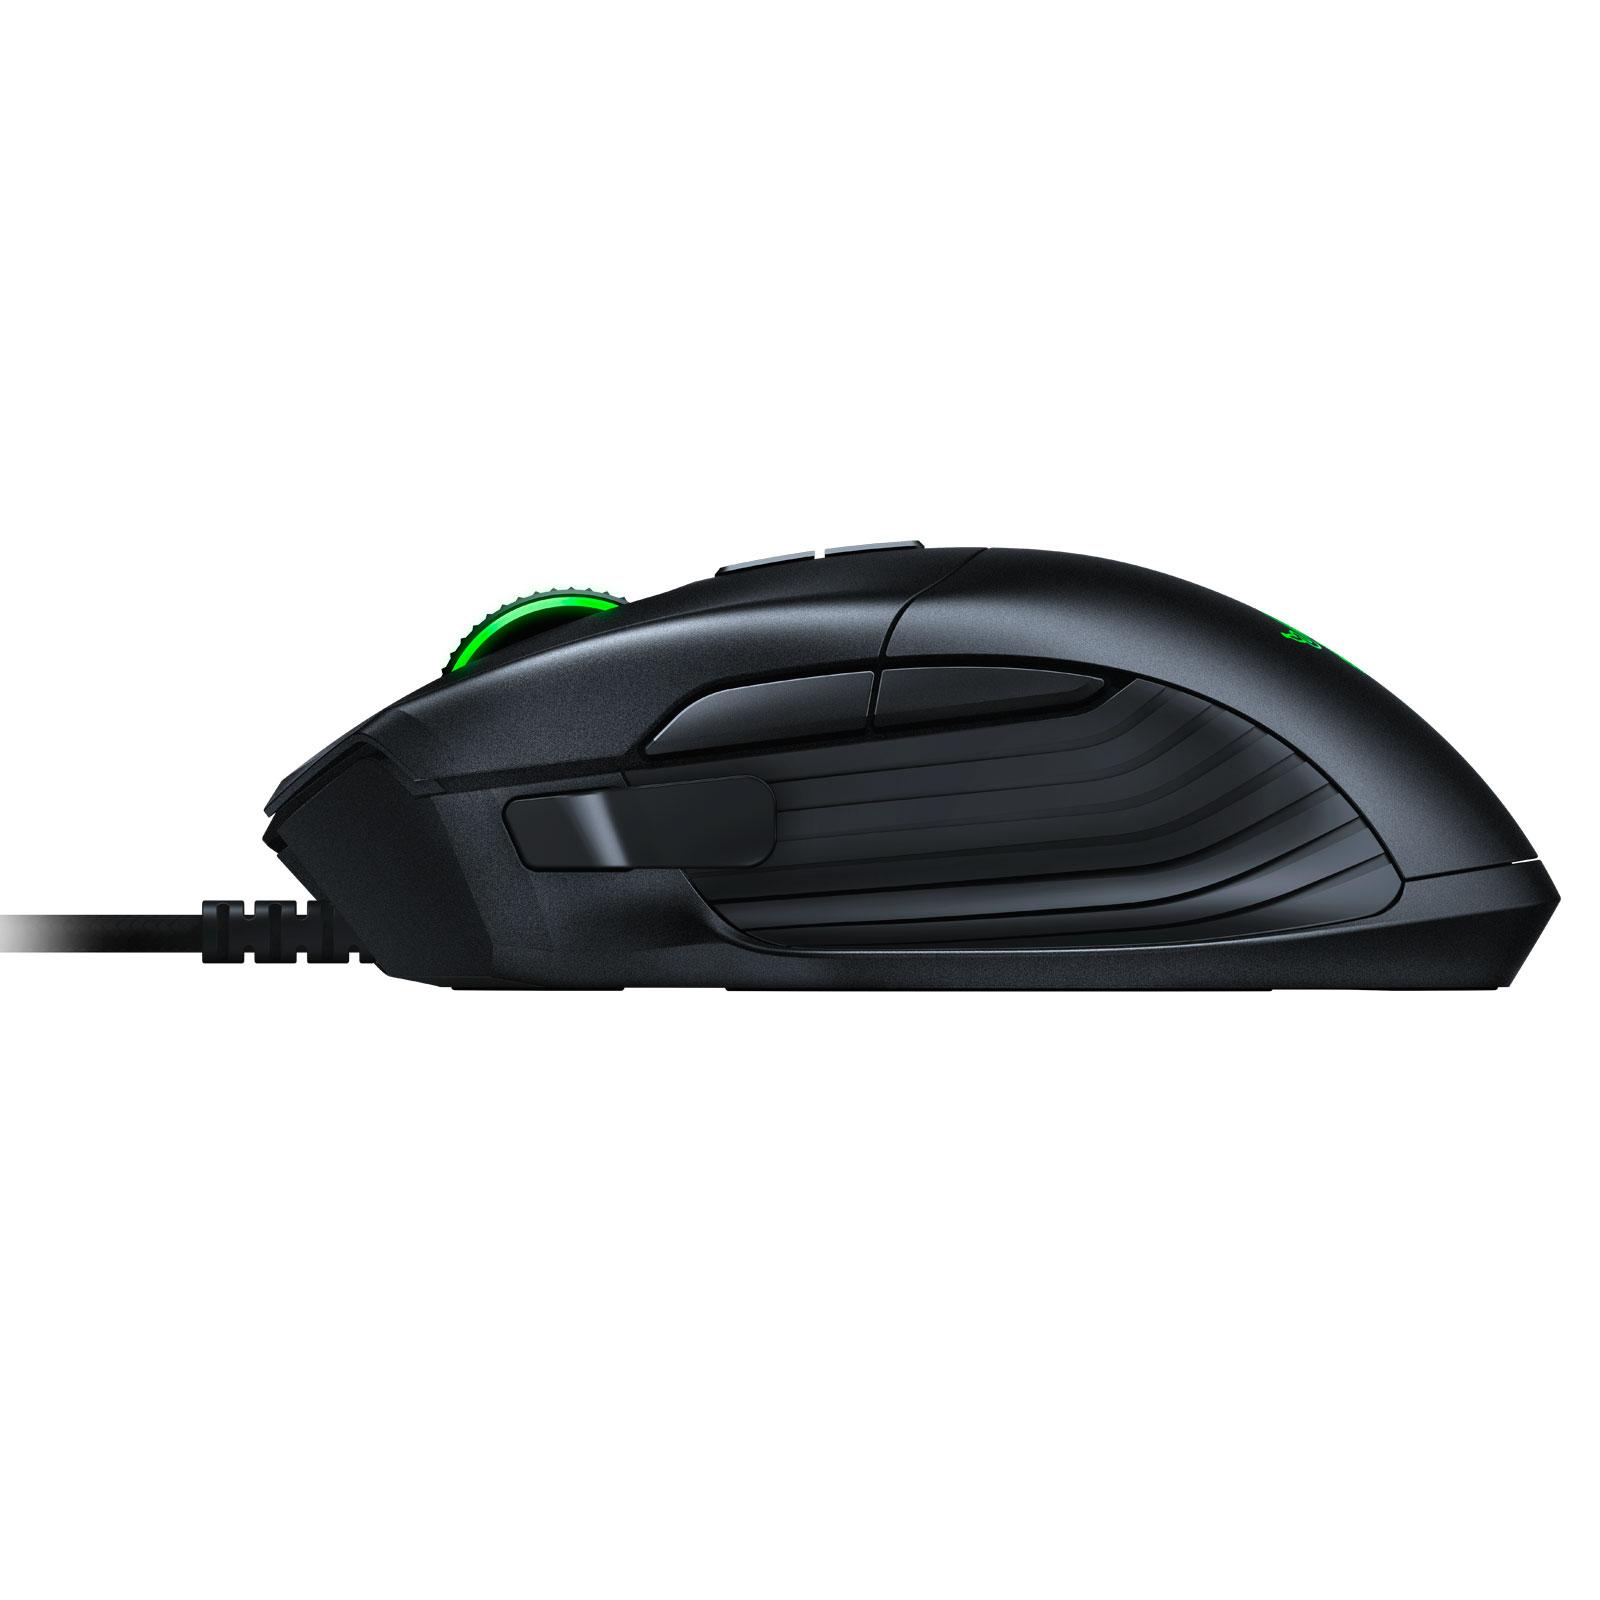 Razer Basilisk - Souris PC Razer - Cybertek.fr - 2